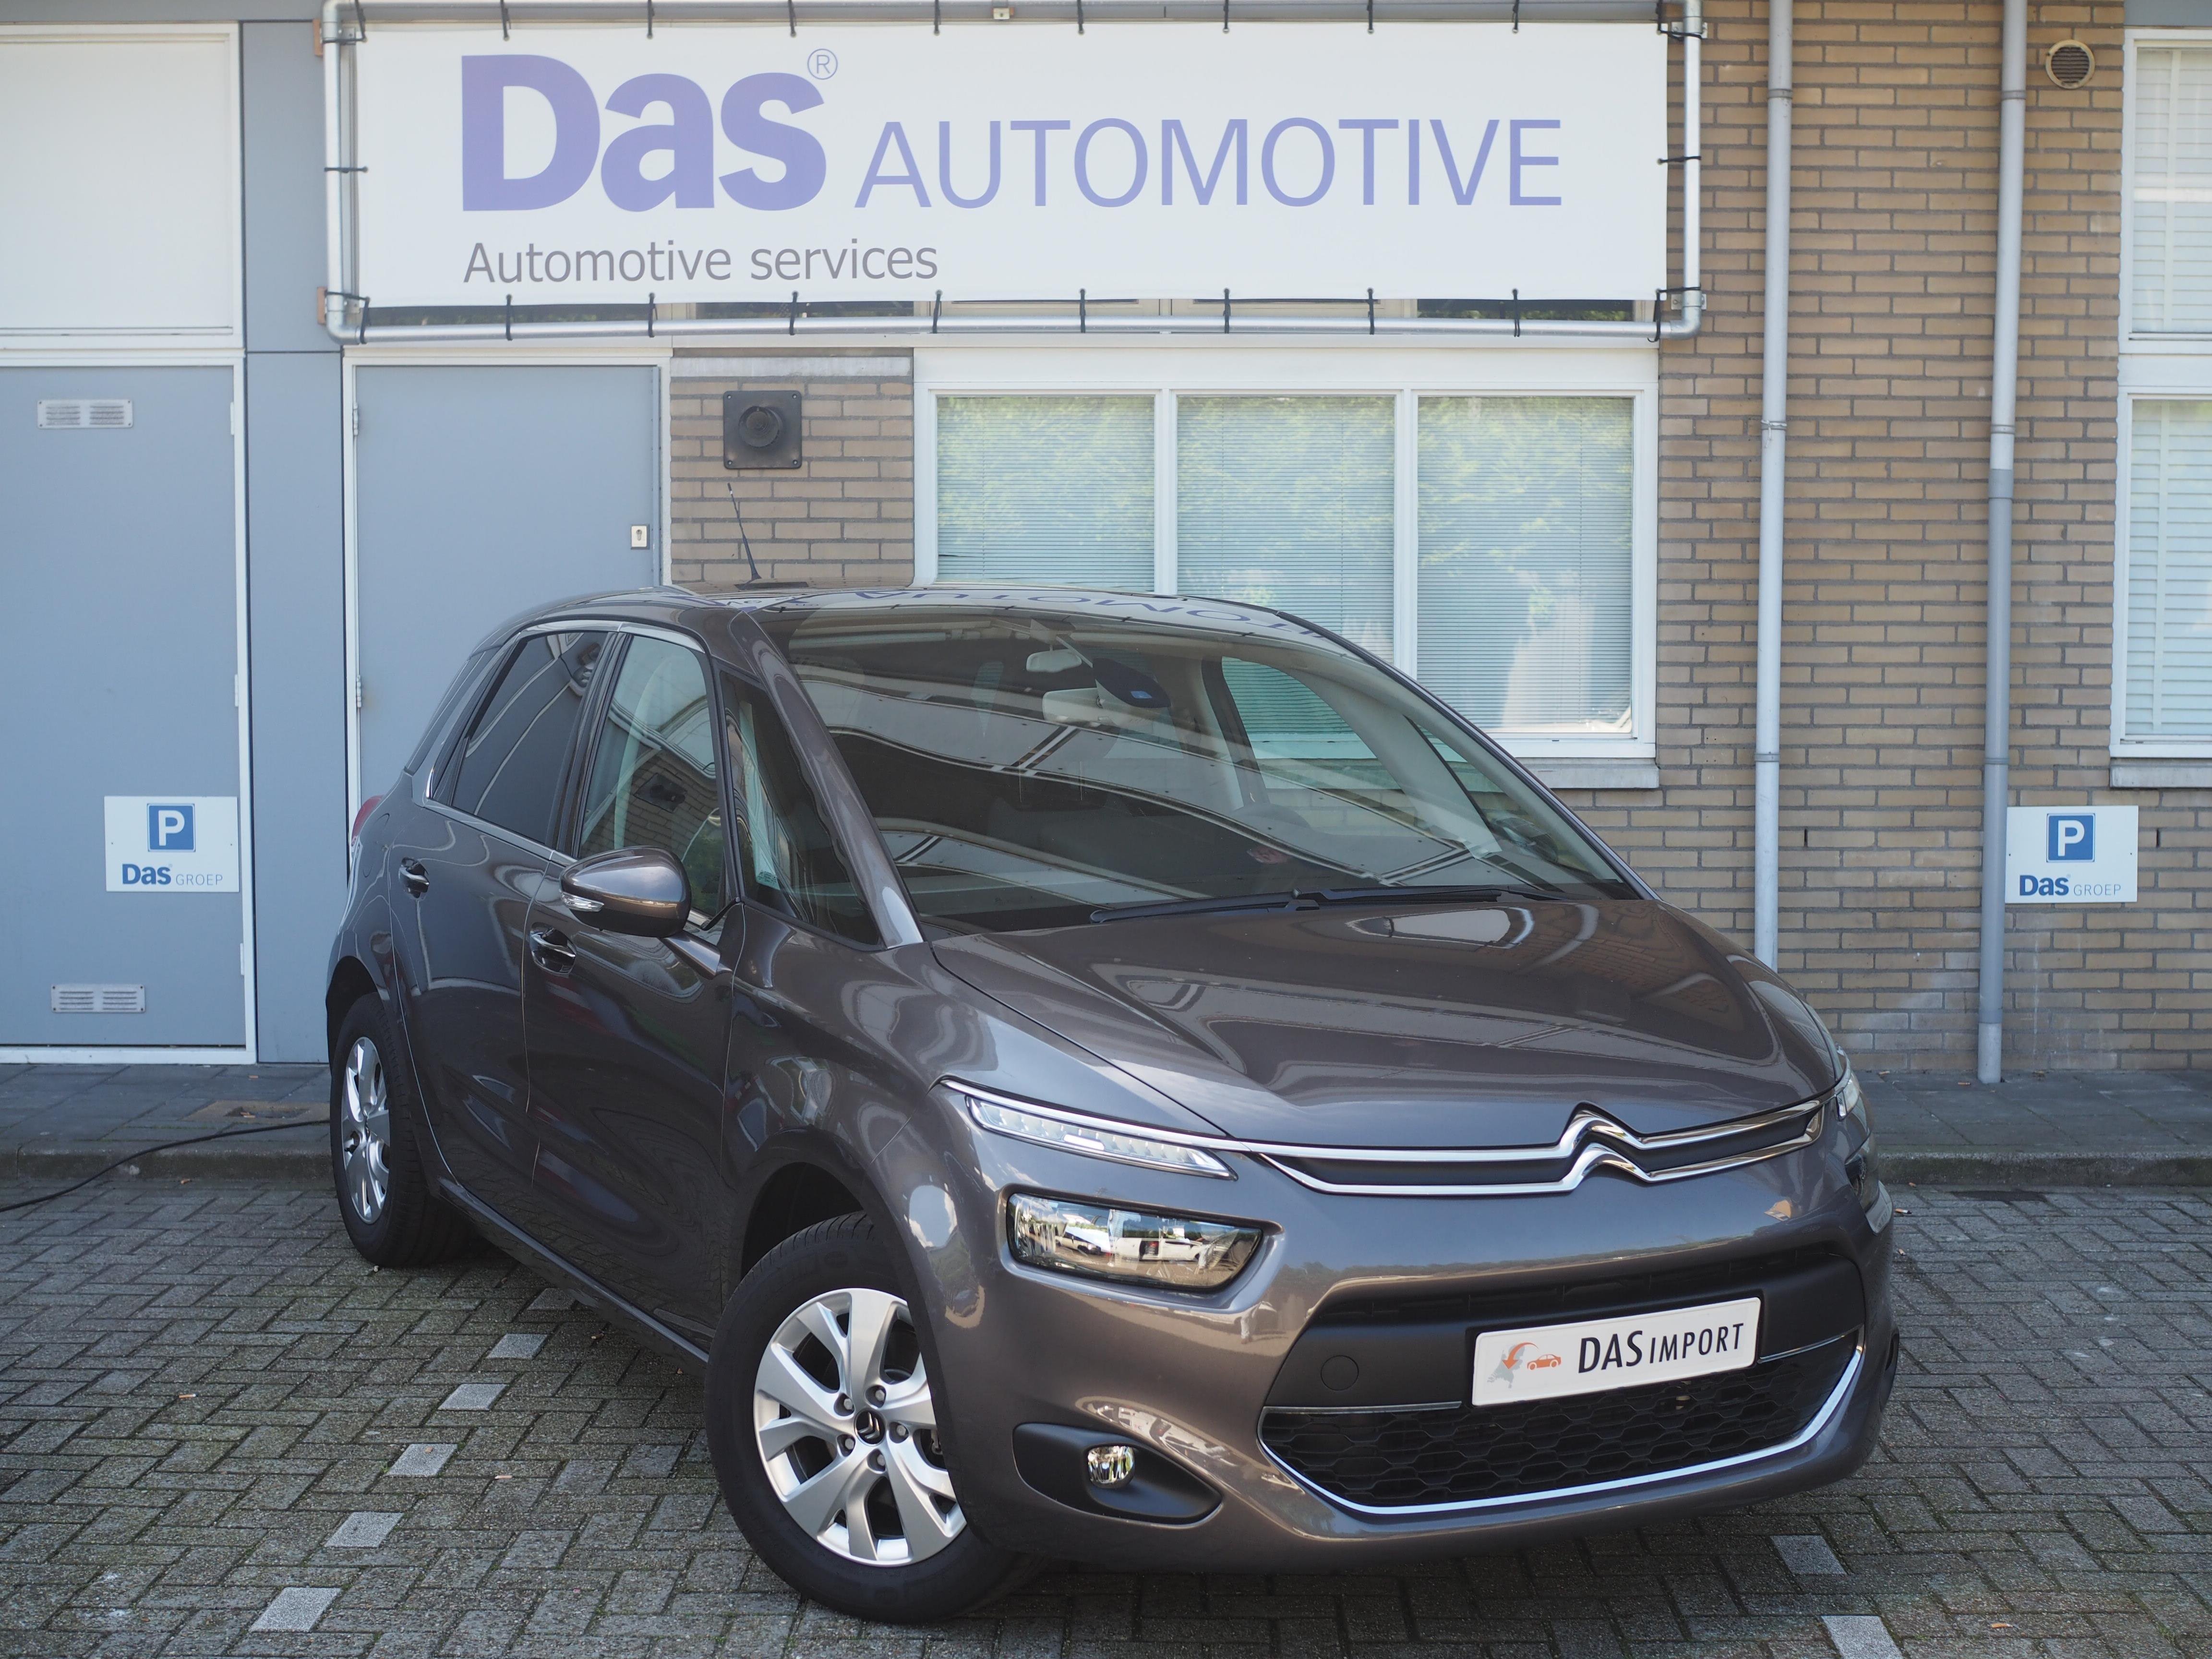 Importauto: Citroën C4 Picasso 1.2 PureTech 130 S&S MAN6 Intensive 2/2016